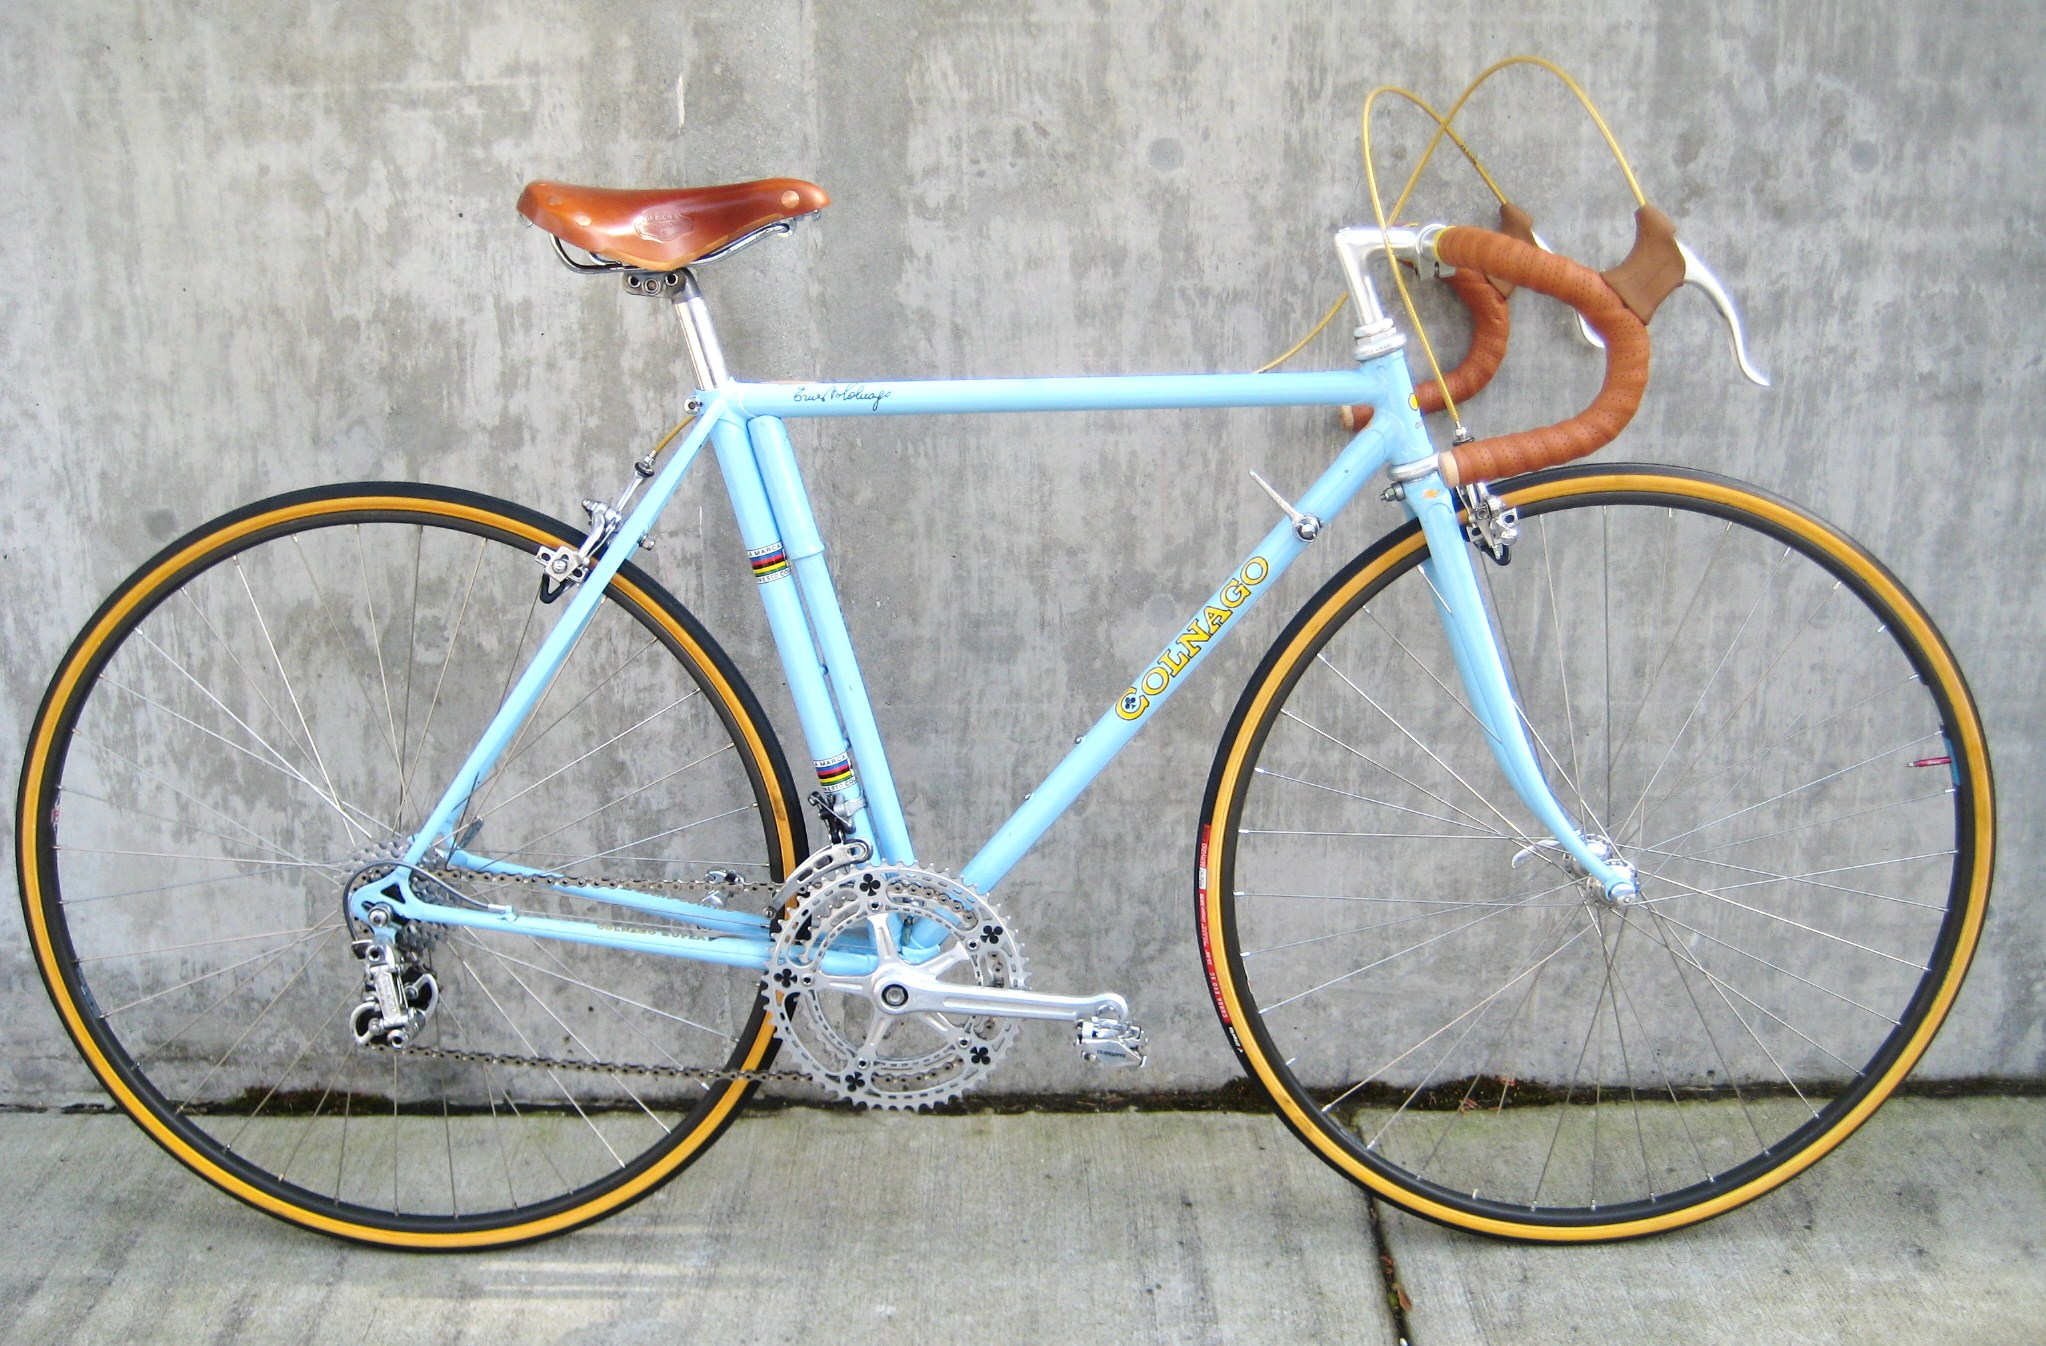 Jaime Amador S 1973 Colnago Super Road Bike Classic